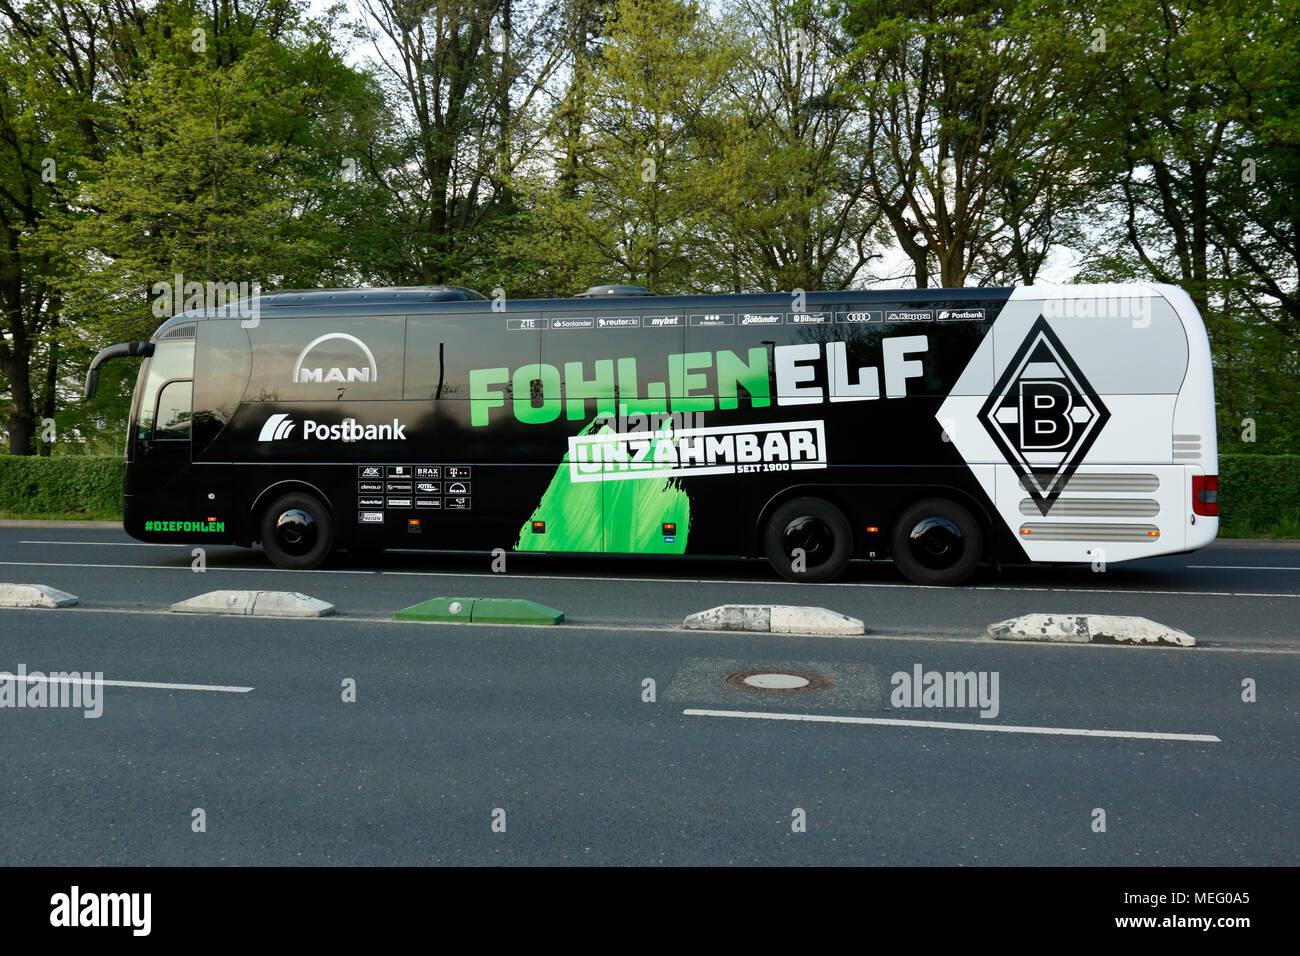 sports,football,Bundesliga,2017/2018,Borussia Moenchengladbach vs VfL Wolfsburg 3:0,Stadium Borussia Park,team bus of Gladbach - Stock Image